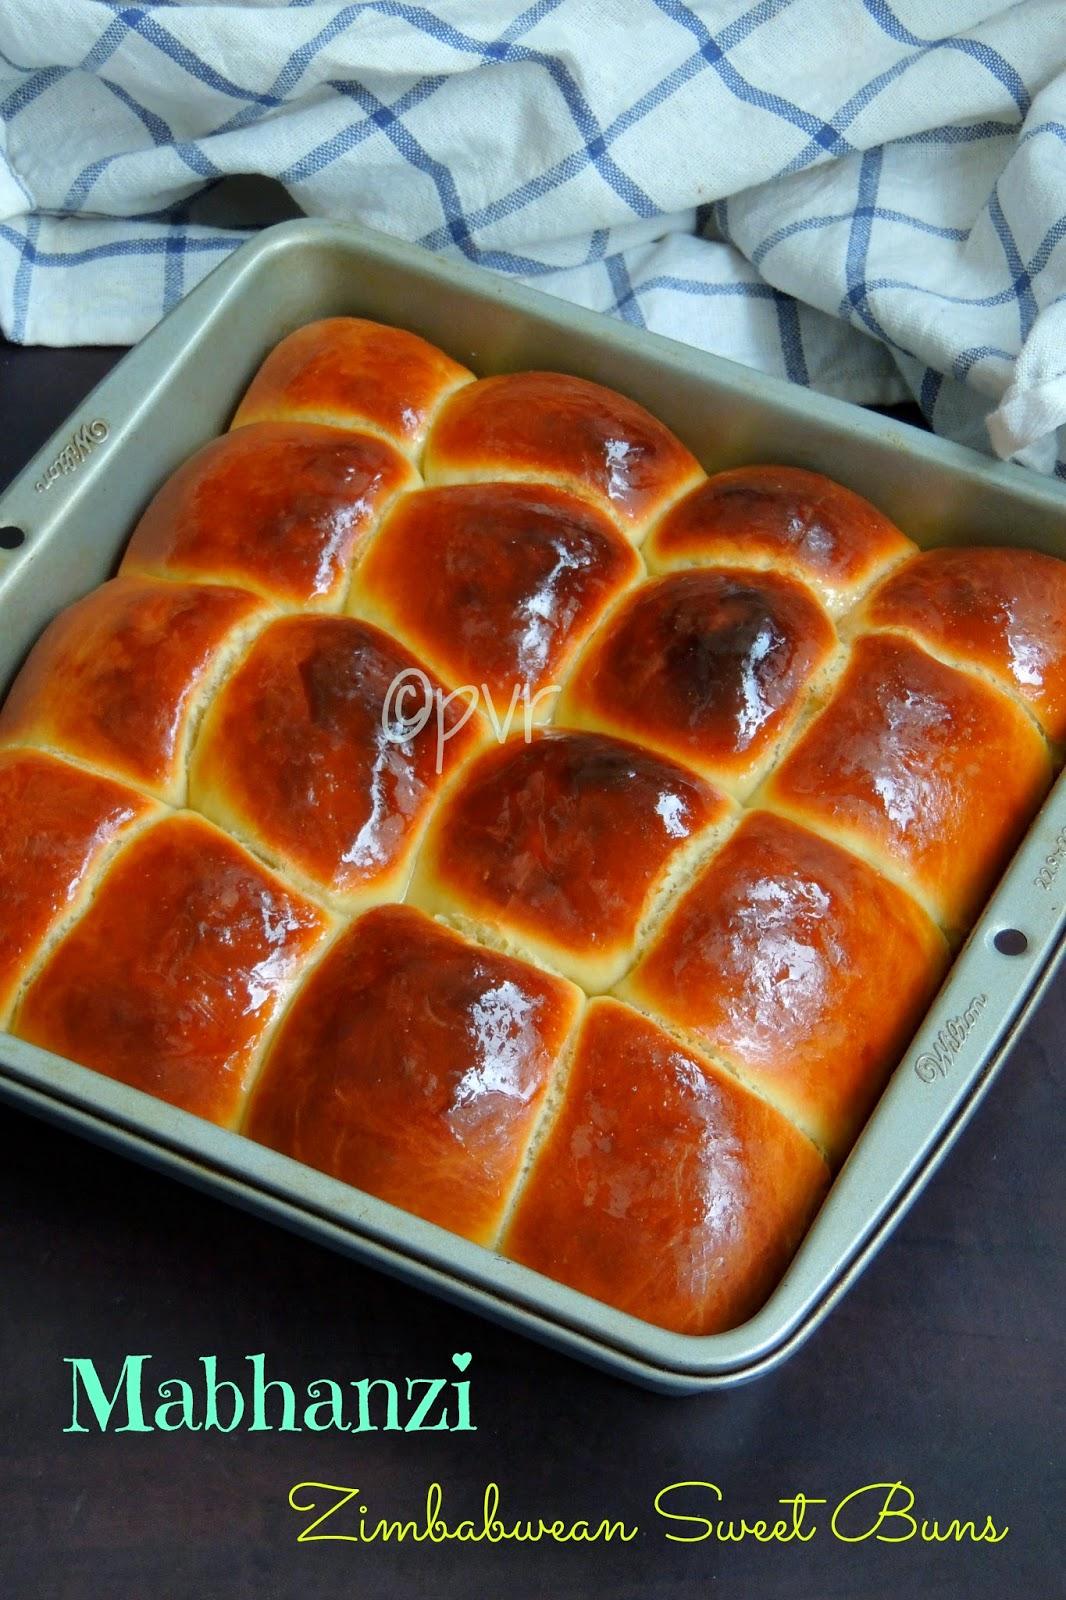 Mabhanzi, Zimbabwean Sweet buns, Farm fresh Mabhanzi